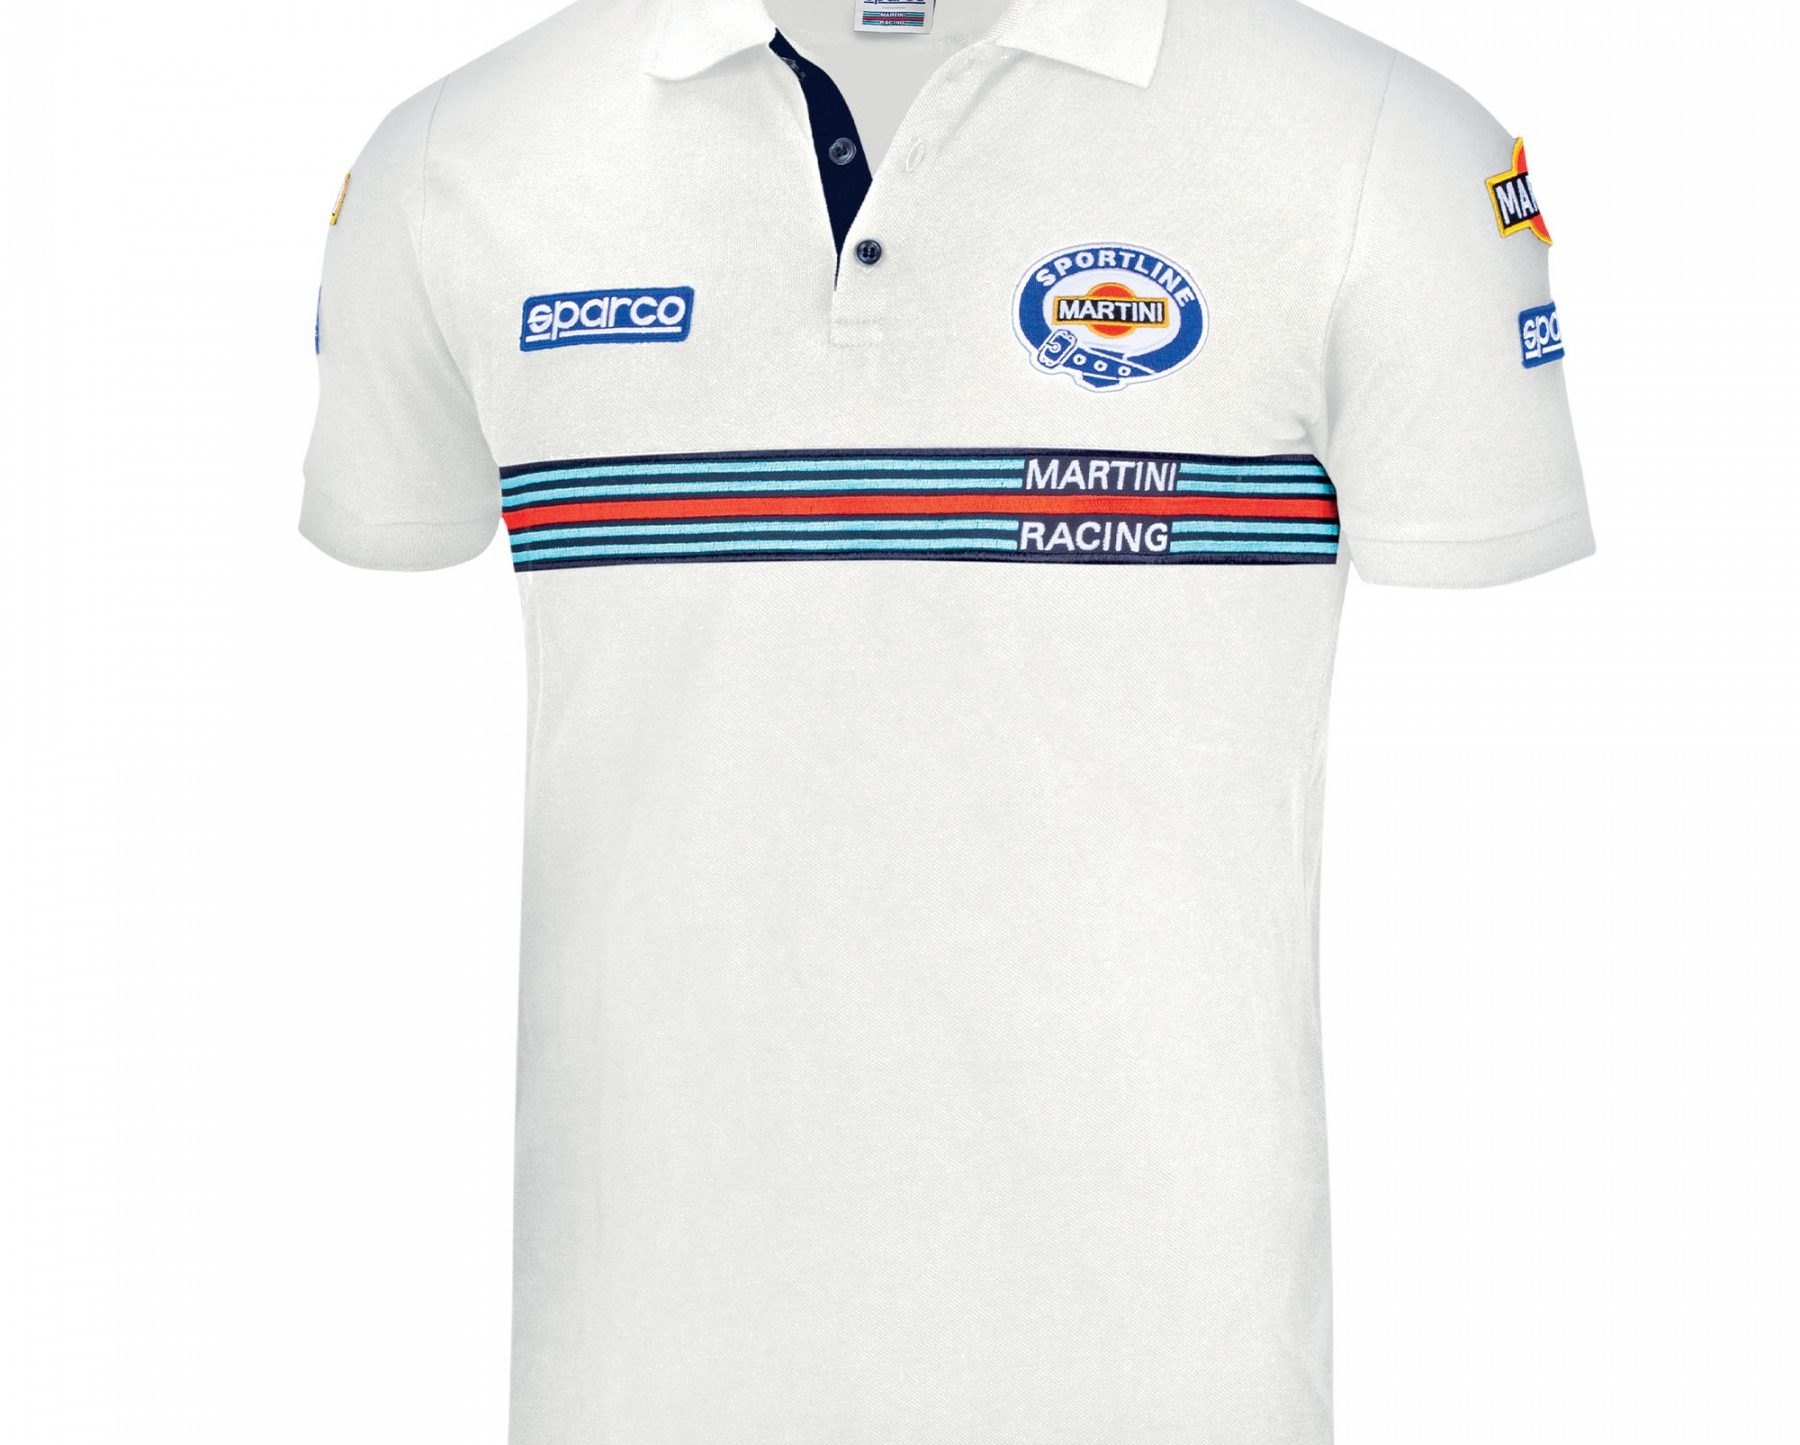 Нов продукт: Sparco Replica Martini Racing, T-shirt